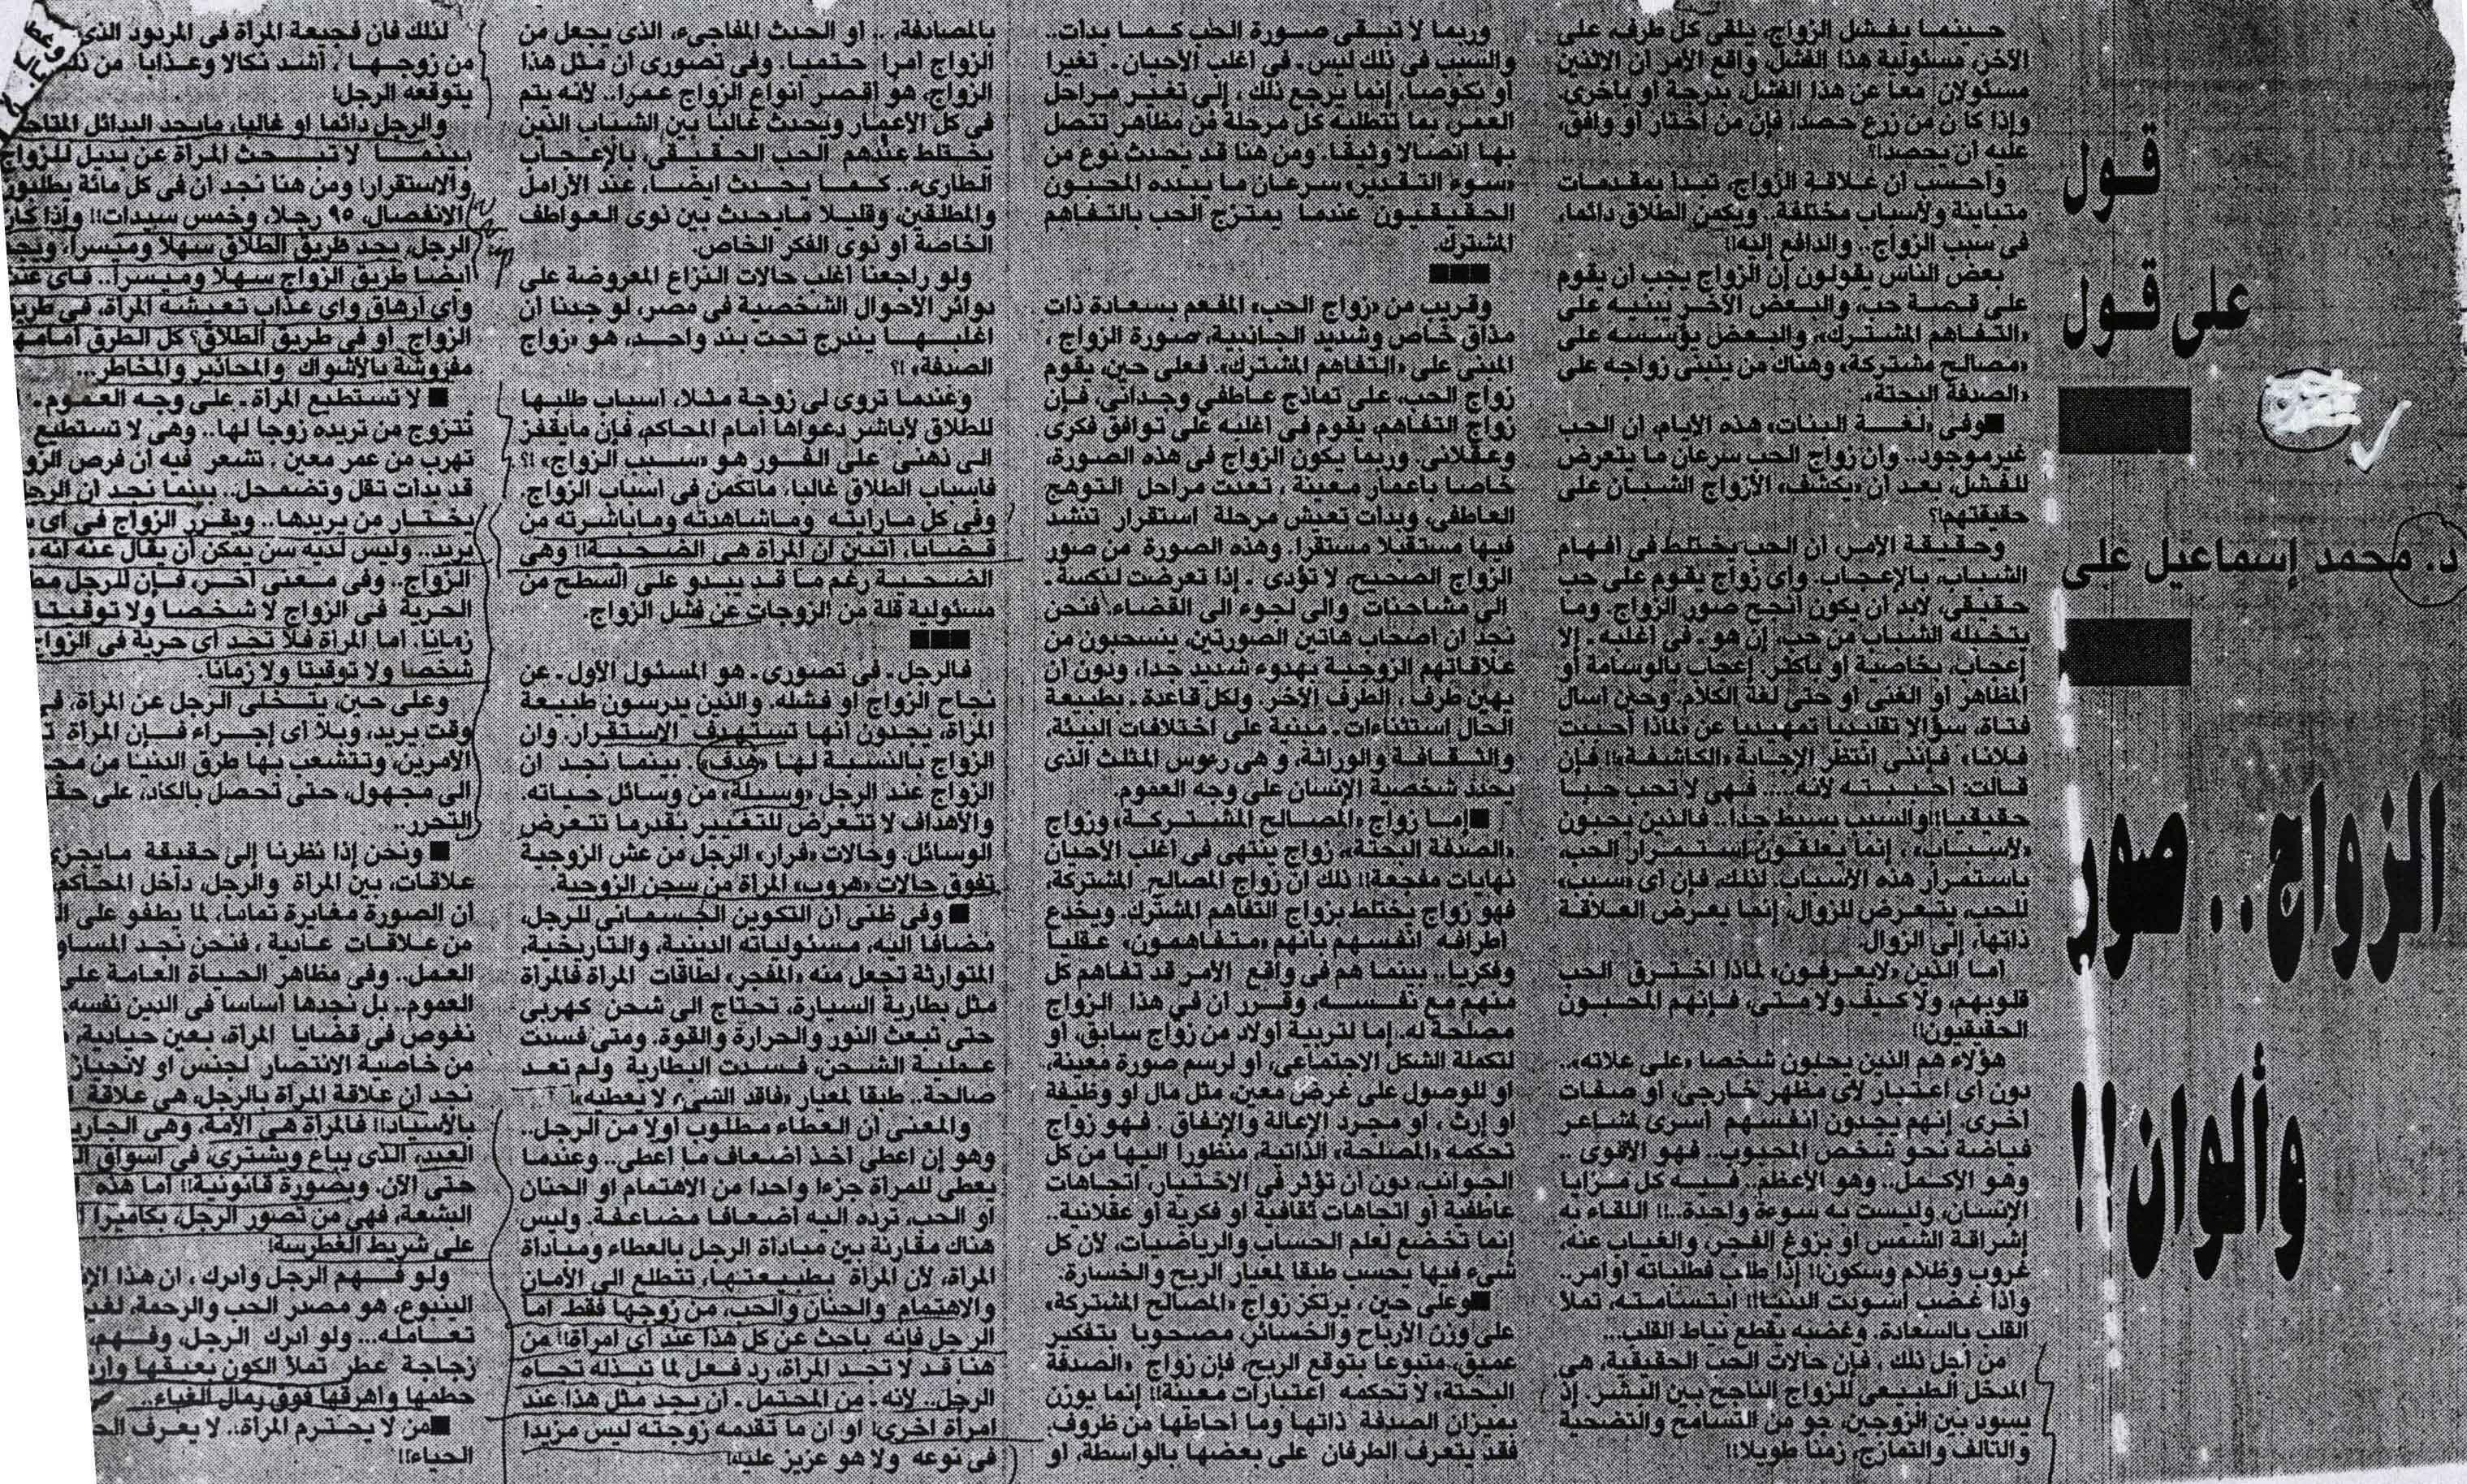 dd80980c0 معني ذلك أن الله بخس المرأة حقوقها في عهود الأنبياء جميعاً ثم تذكرها عندما  جاء نبي الإسلام .